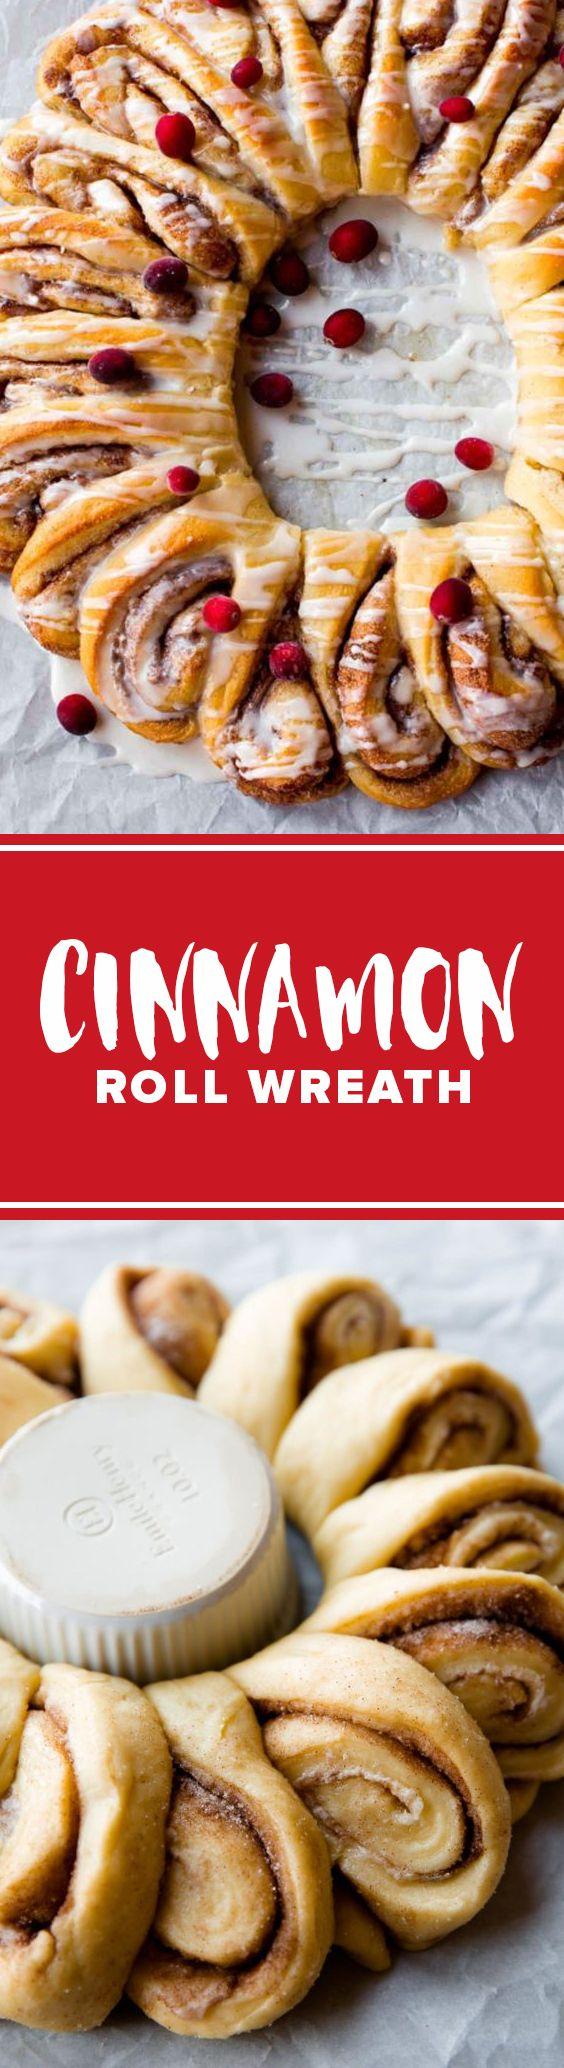 Deliciously beautiful cinnamon roll wreath!! Homemade easy cinnamon rolls with icing recipe on http://sallysbakingaddiction.com/2016/11/18/cinnamon-roll-wreath/